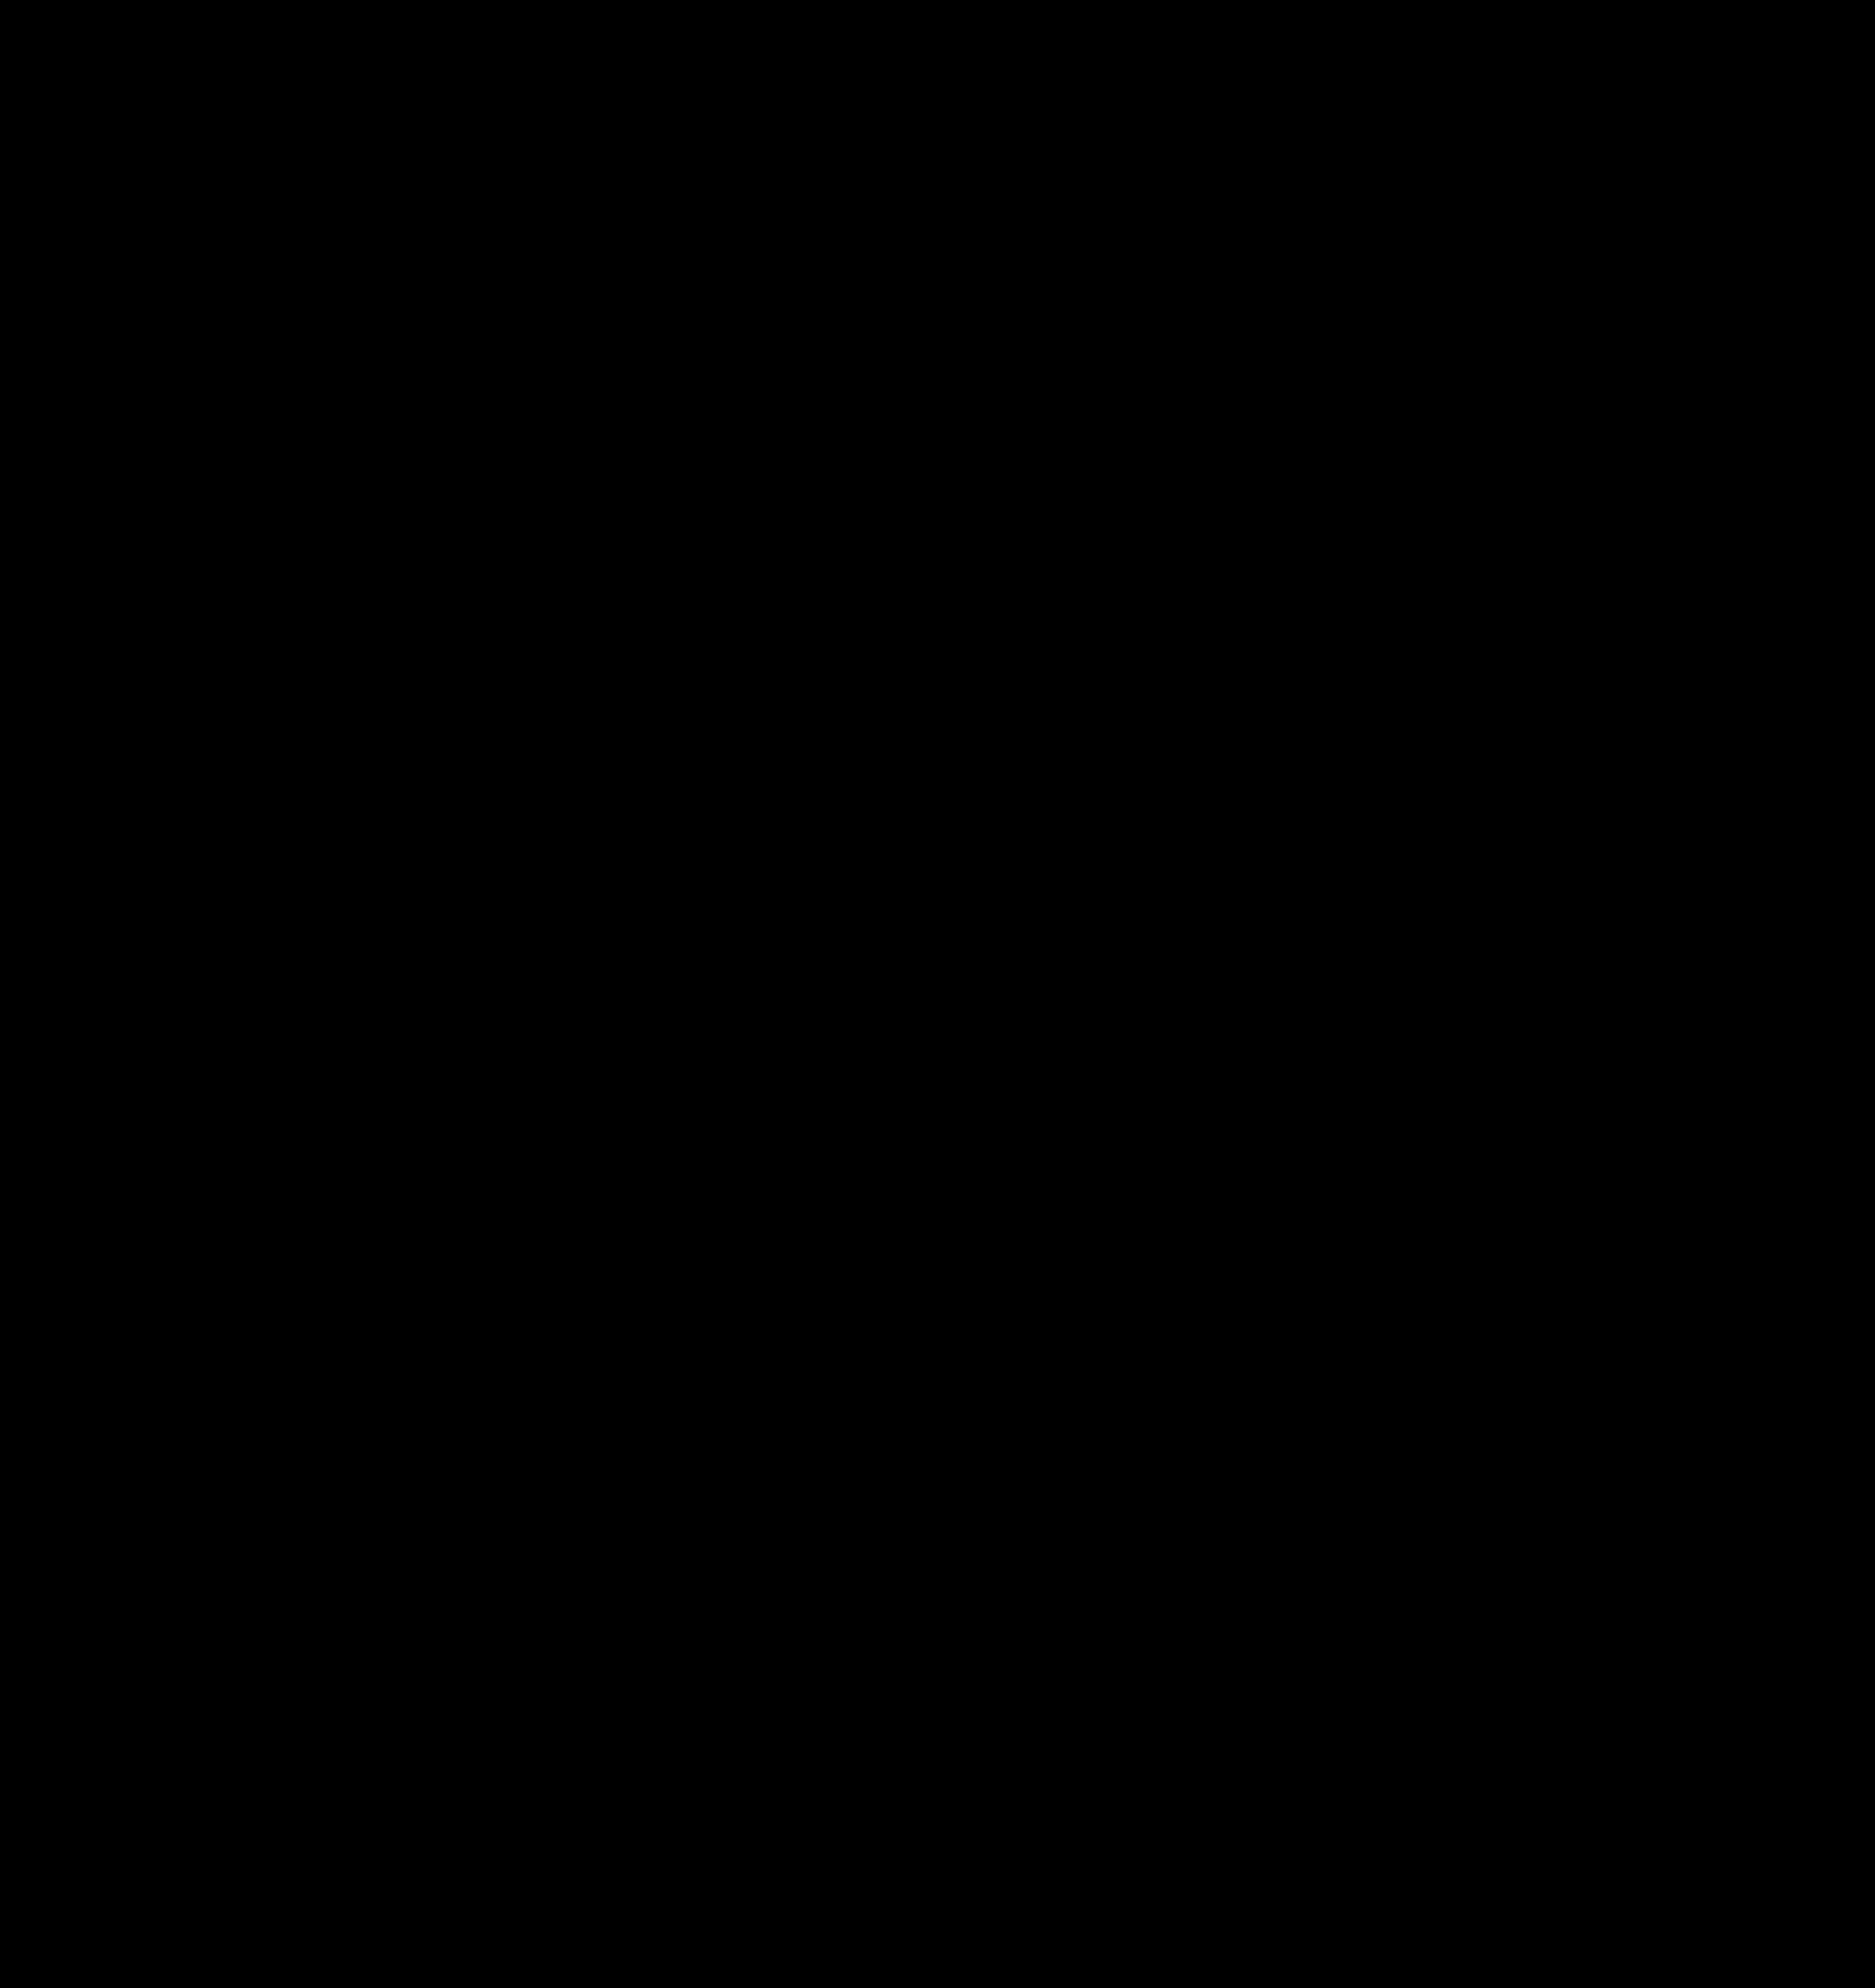 BIG IMAGE (PNG) - PNG Kneeling